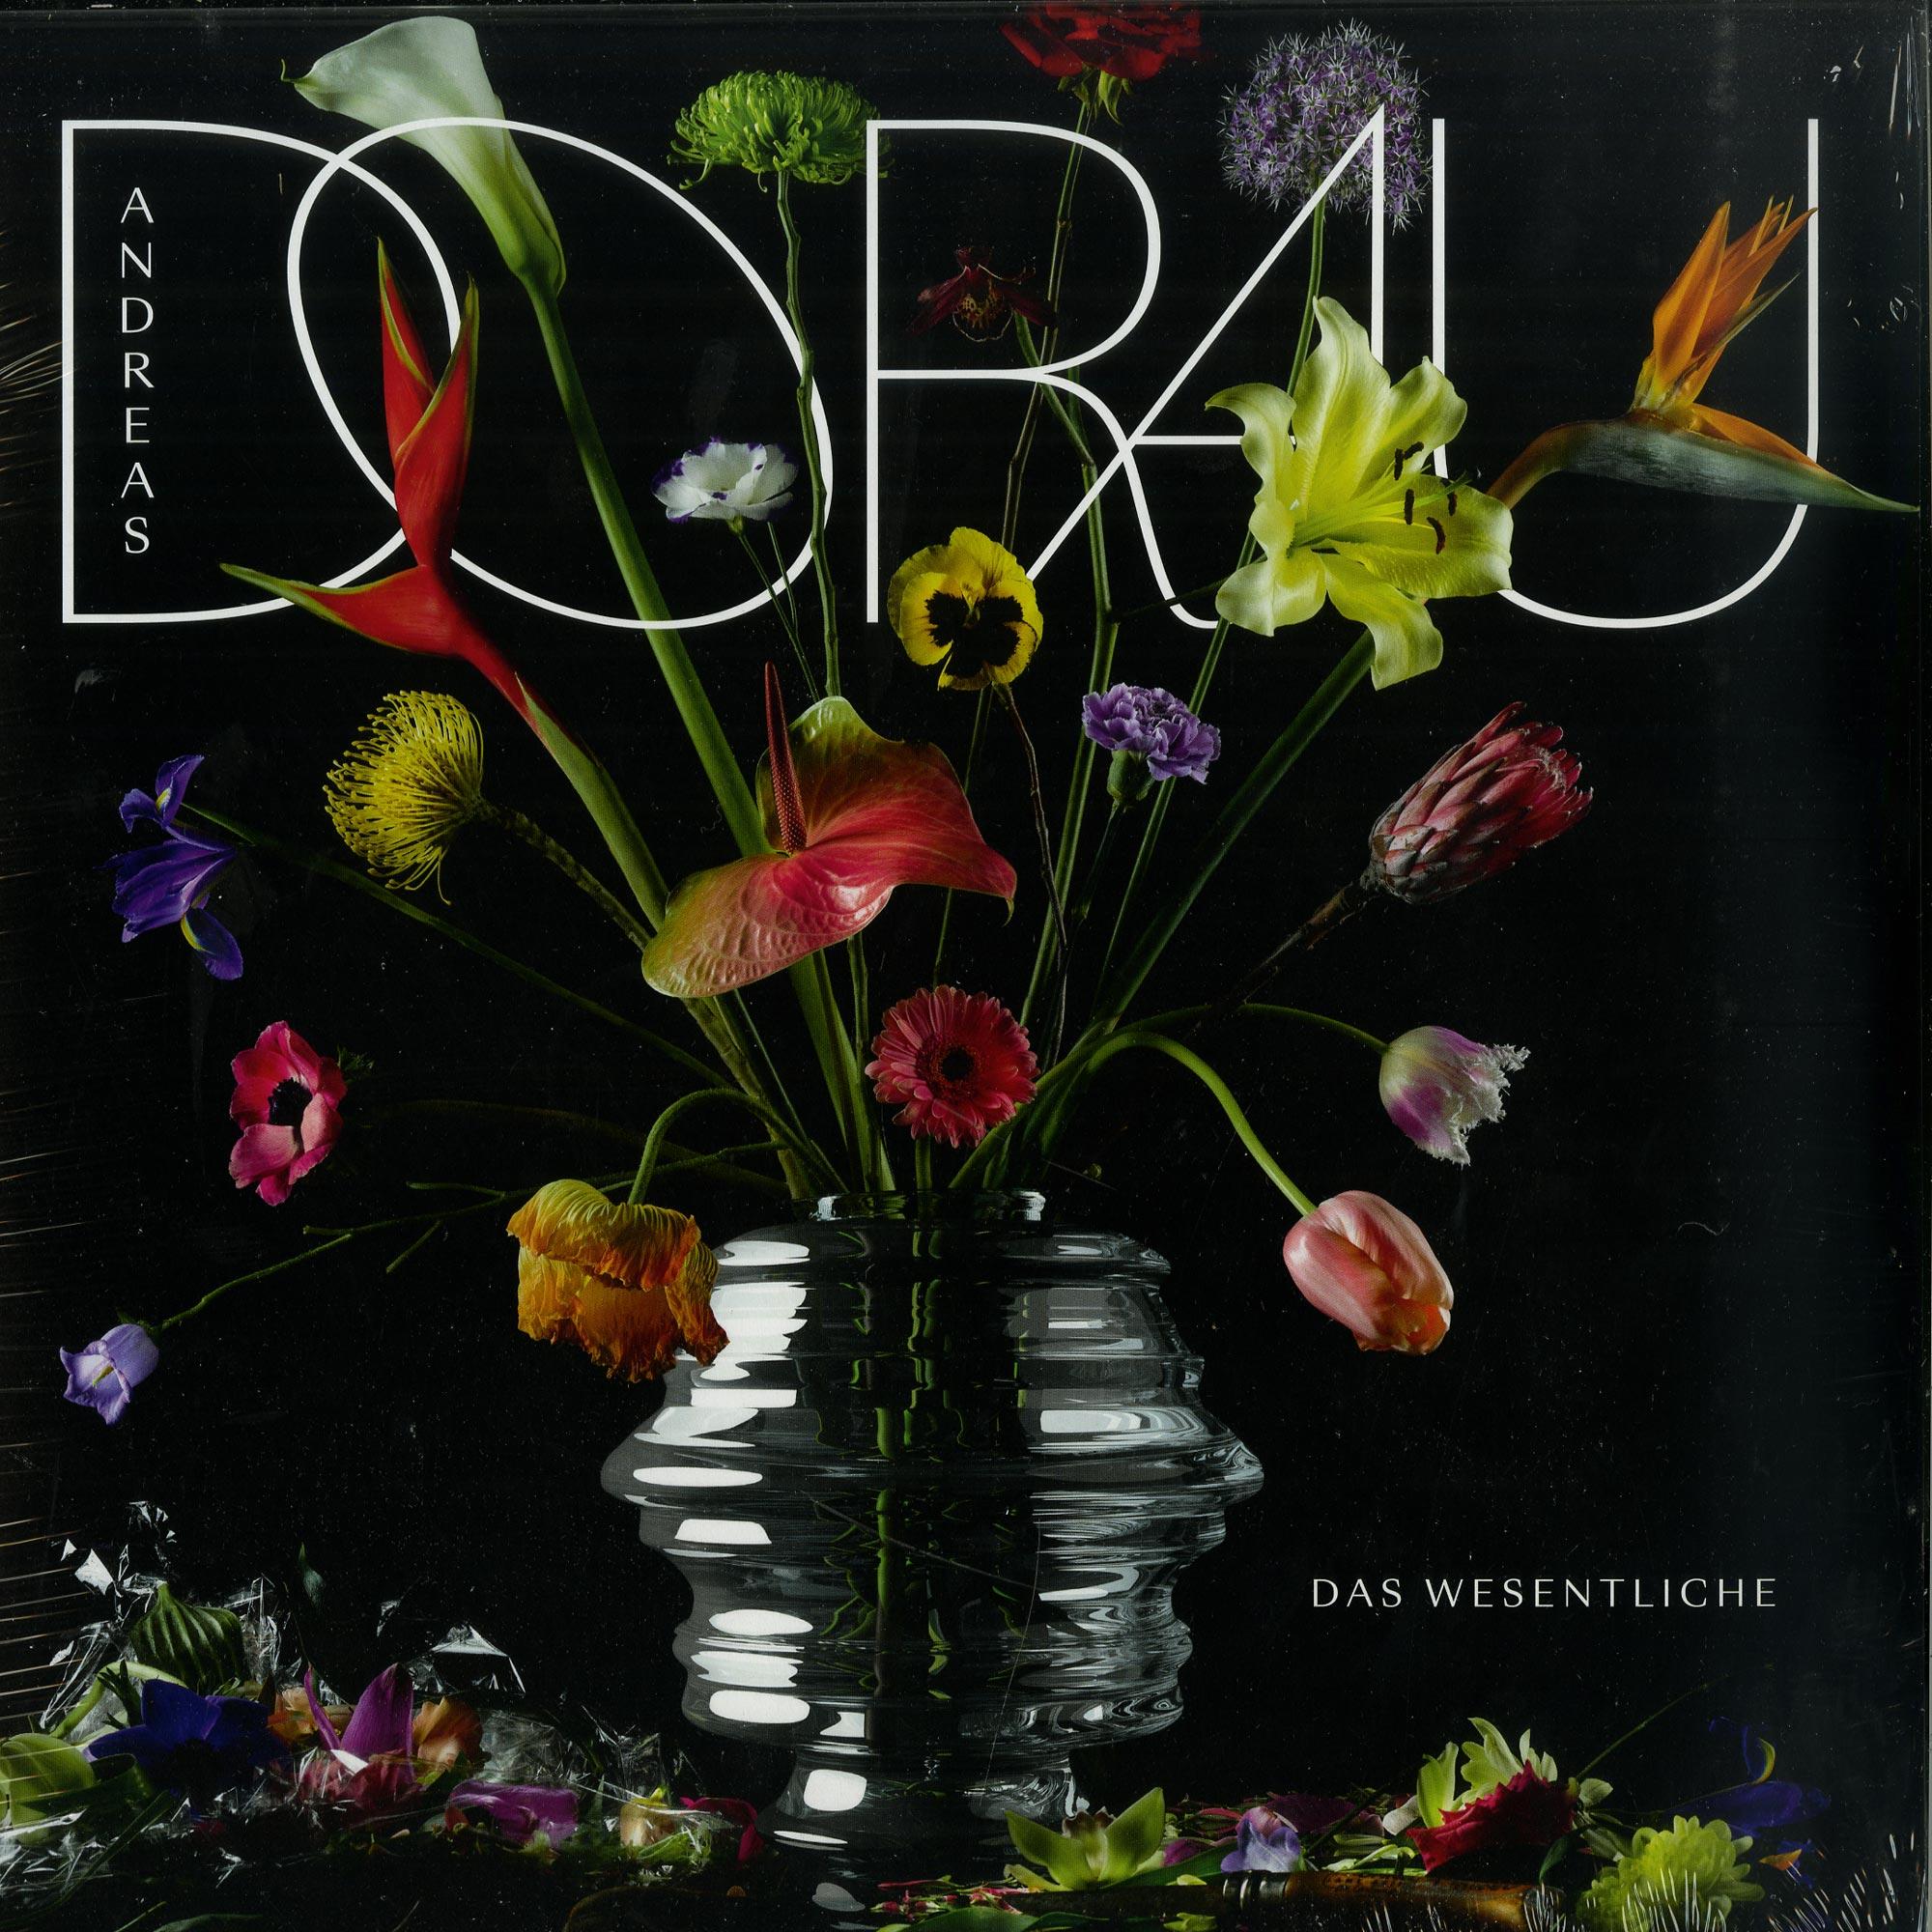 Andreas Dorau - DAS WESENTLICHE